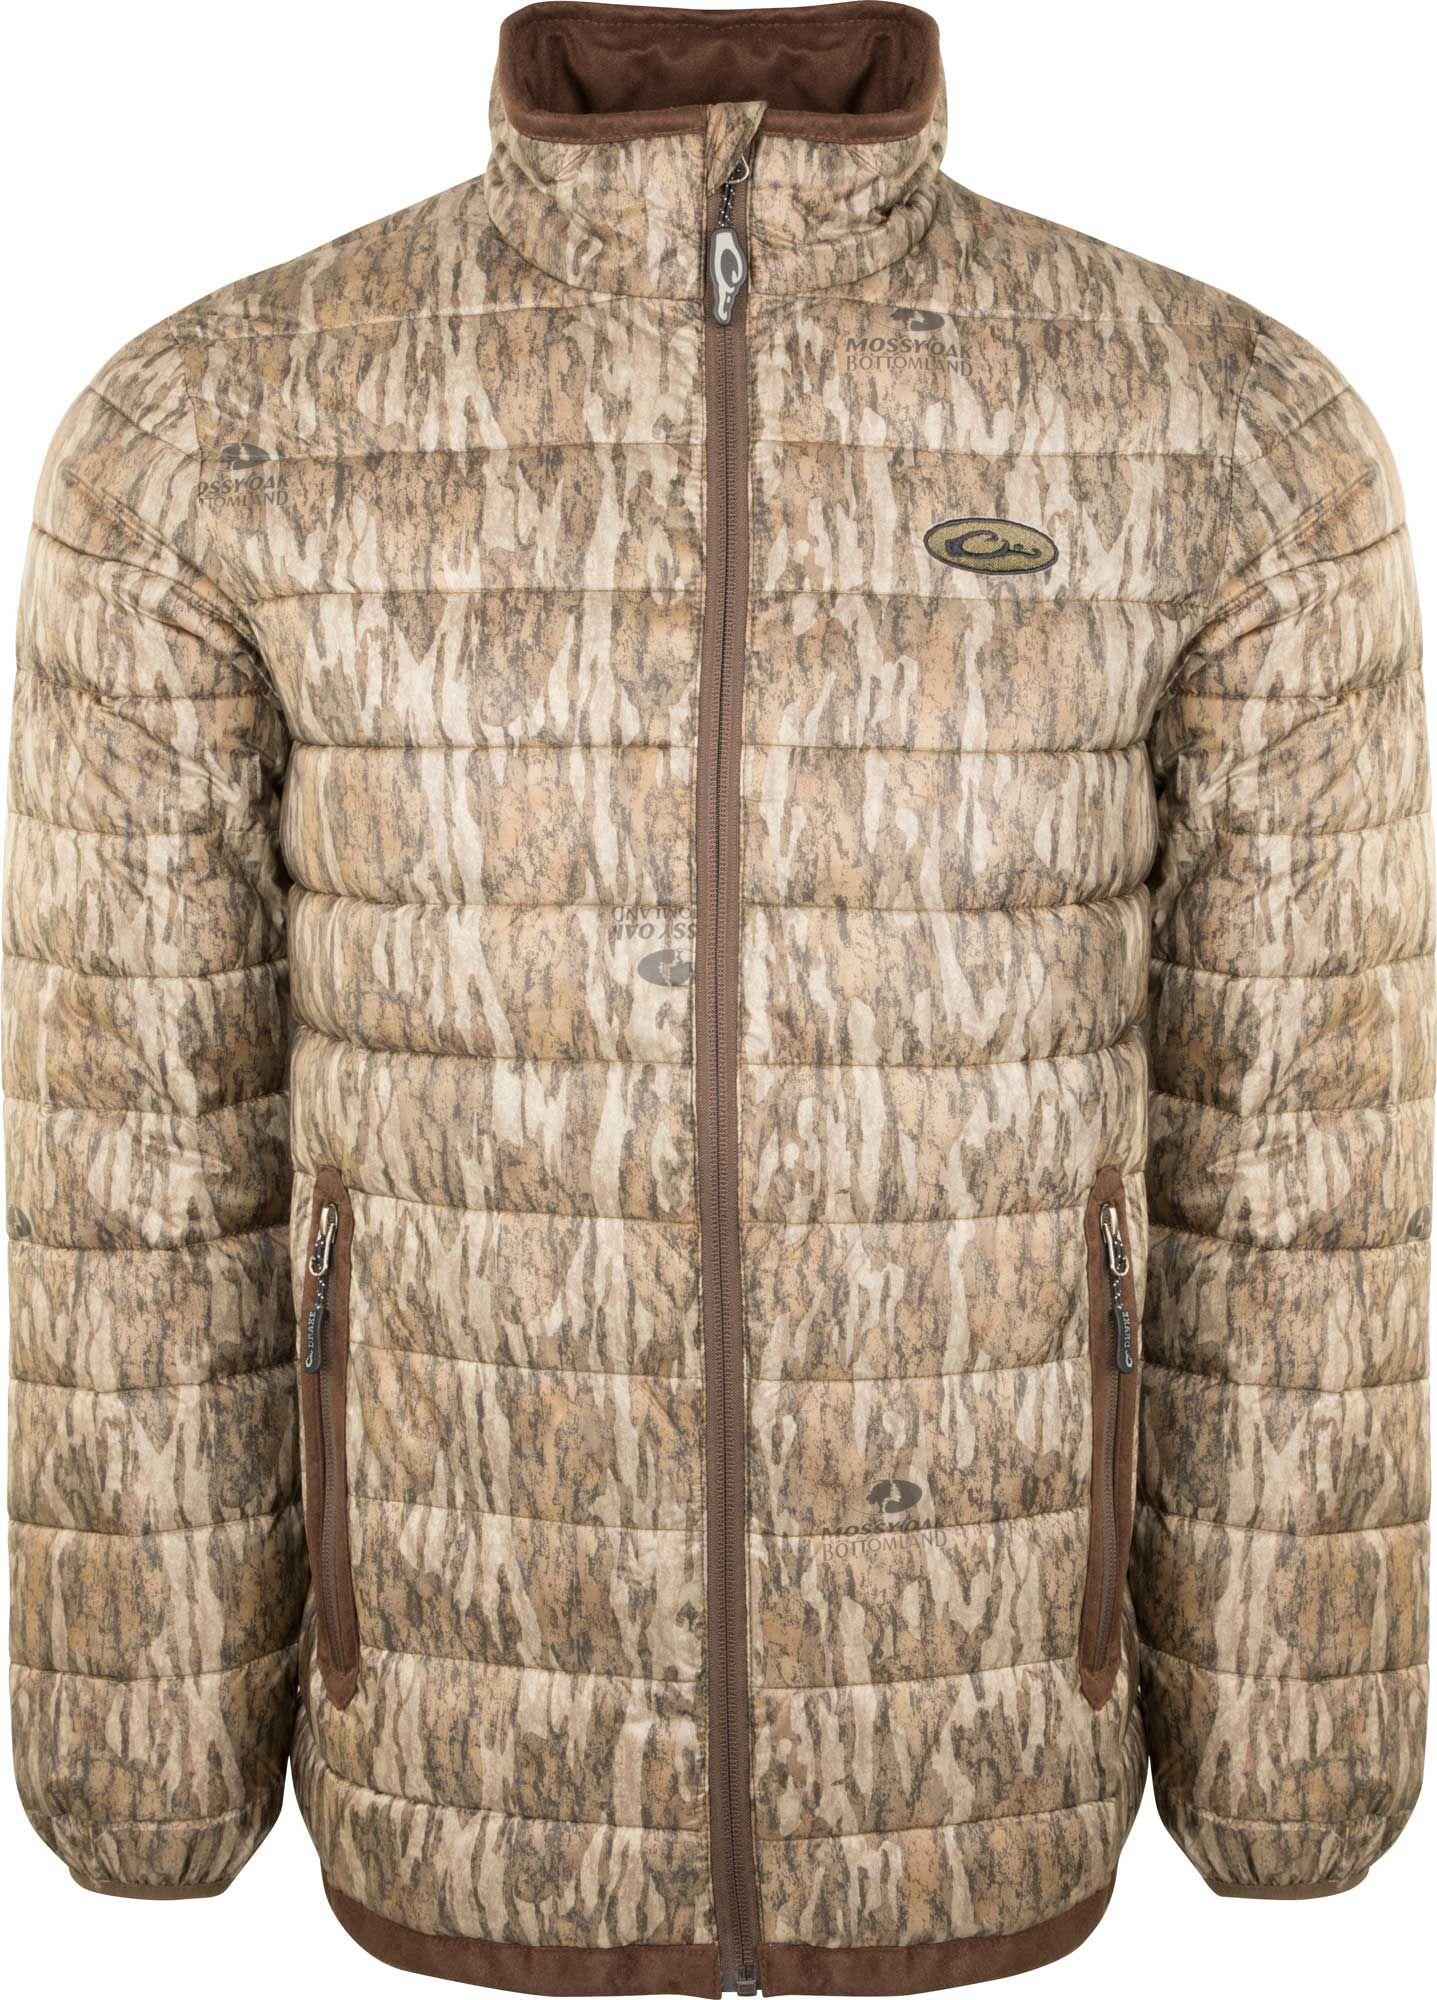 Drake Waterfowl Men's Camo Double Down Layering Full Zip Hunting Jacket, Size: Small, Mossy Oak Bottomland